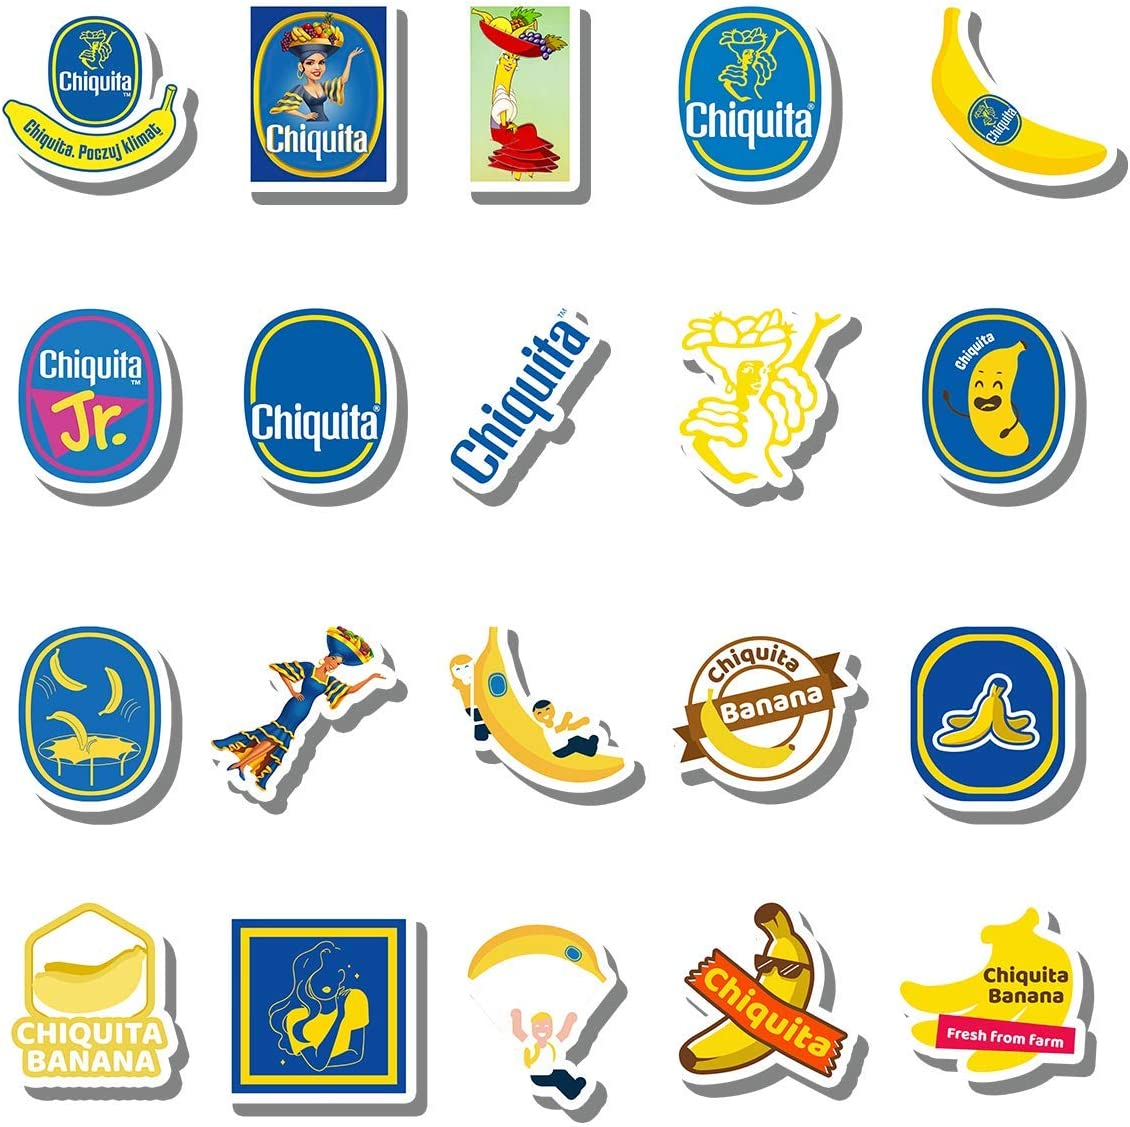 20 PCS Stickers Pack Chiquita Aesthetic Banana Vinyl Colorful Waterproof for Water Bottle Laptop Bumper Car Bike Luggage Guitar Skateboard